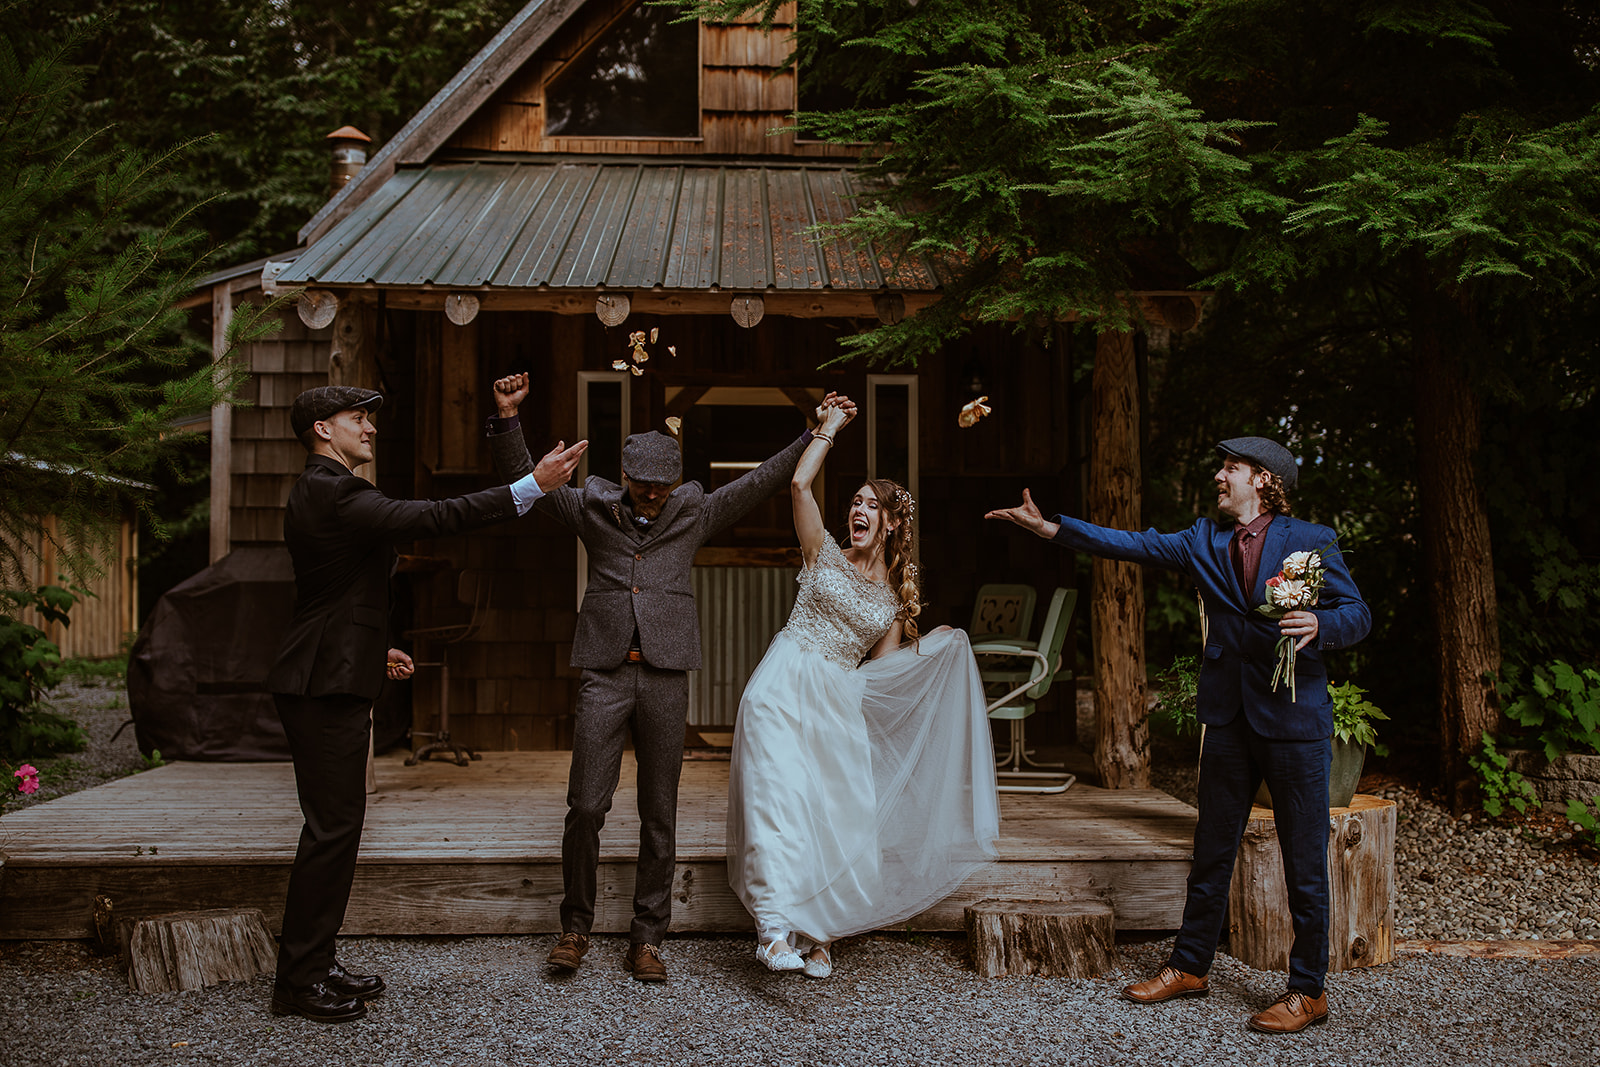 mount-rainier-cabin-elopement-megan-gallagher-photography_(250_of_568).jpg